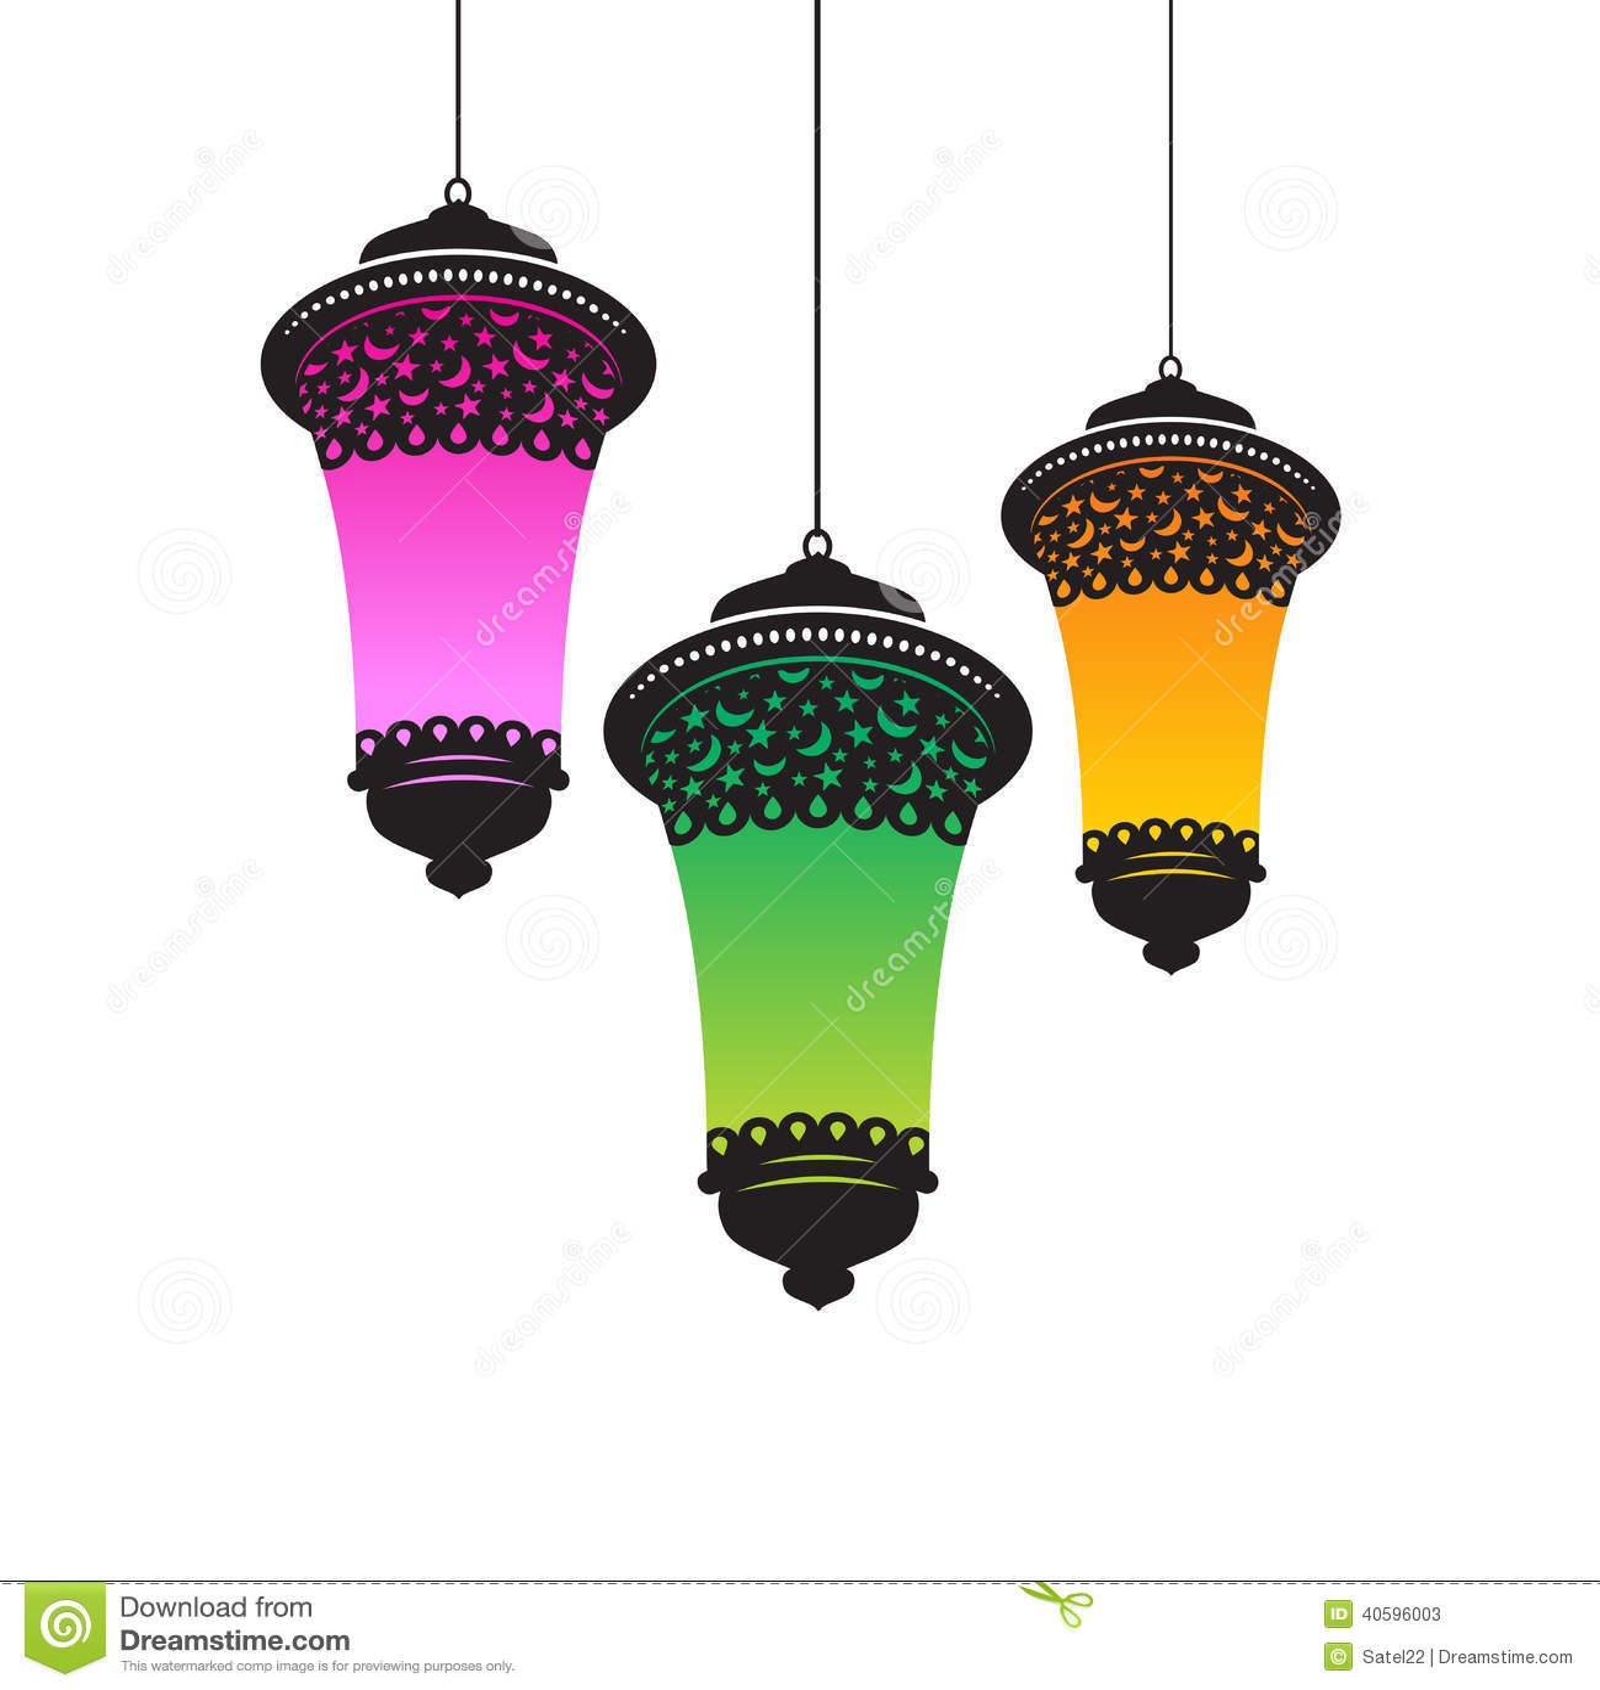 Ramadan lights stock vector. Illustration of dangler - 40596003 for Islamic Lantern Png  5lp5wja